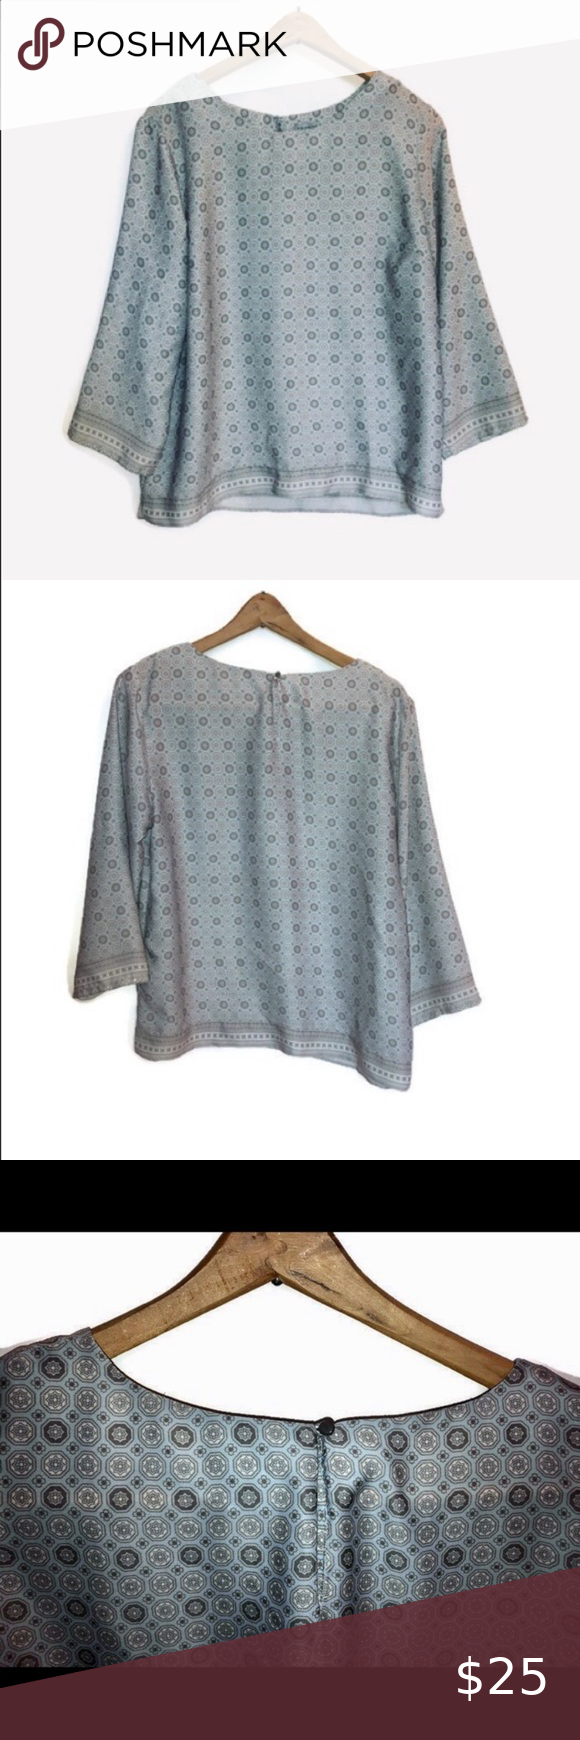 Paraphrase Lightweight 3 4 Sleeve Shirt Clothe Design Shirts Pants Pant